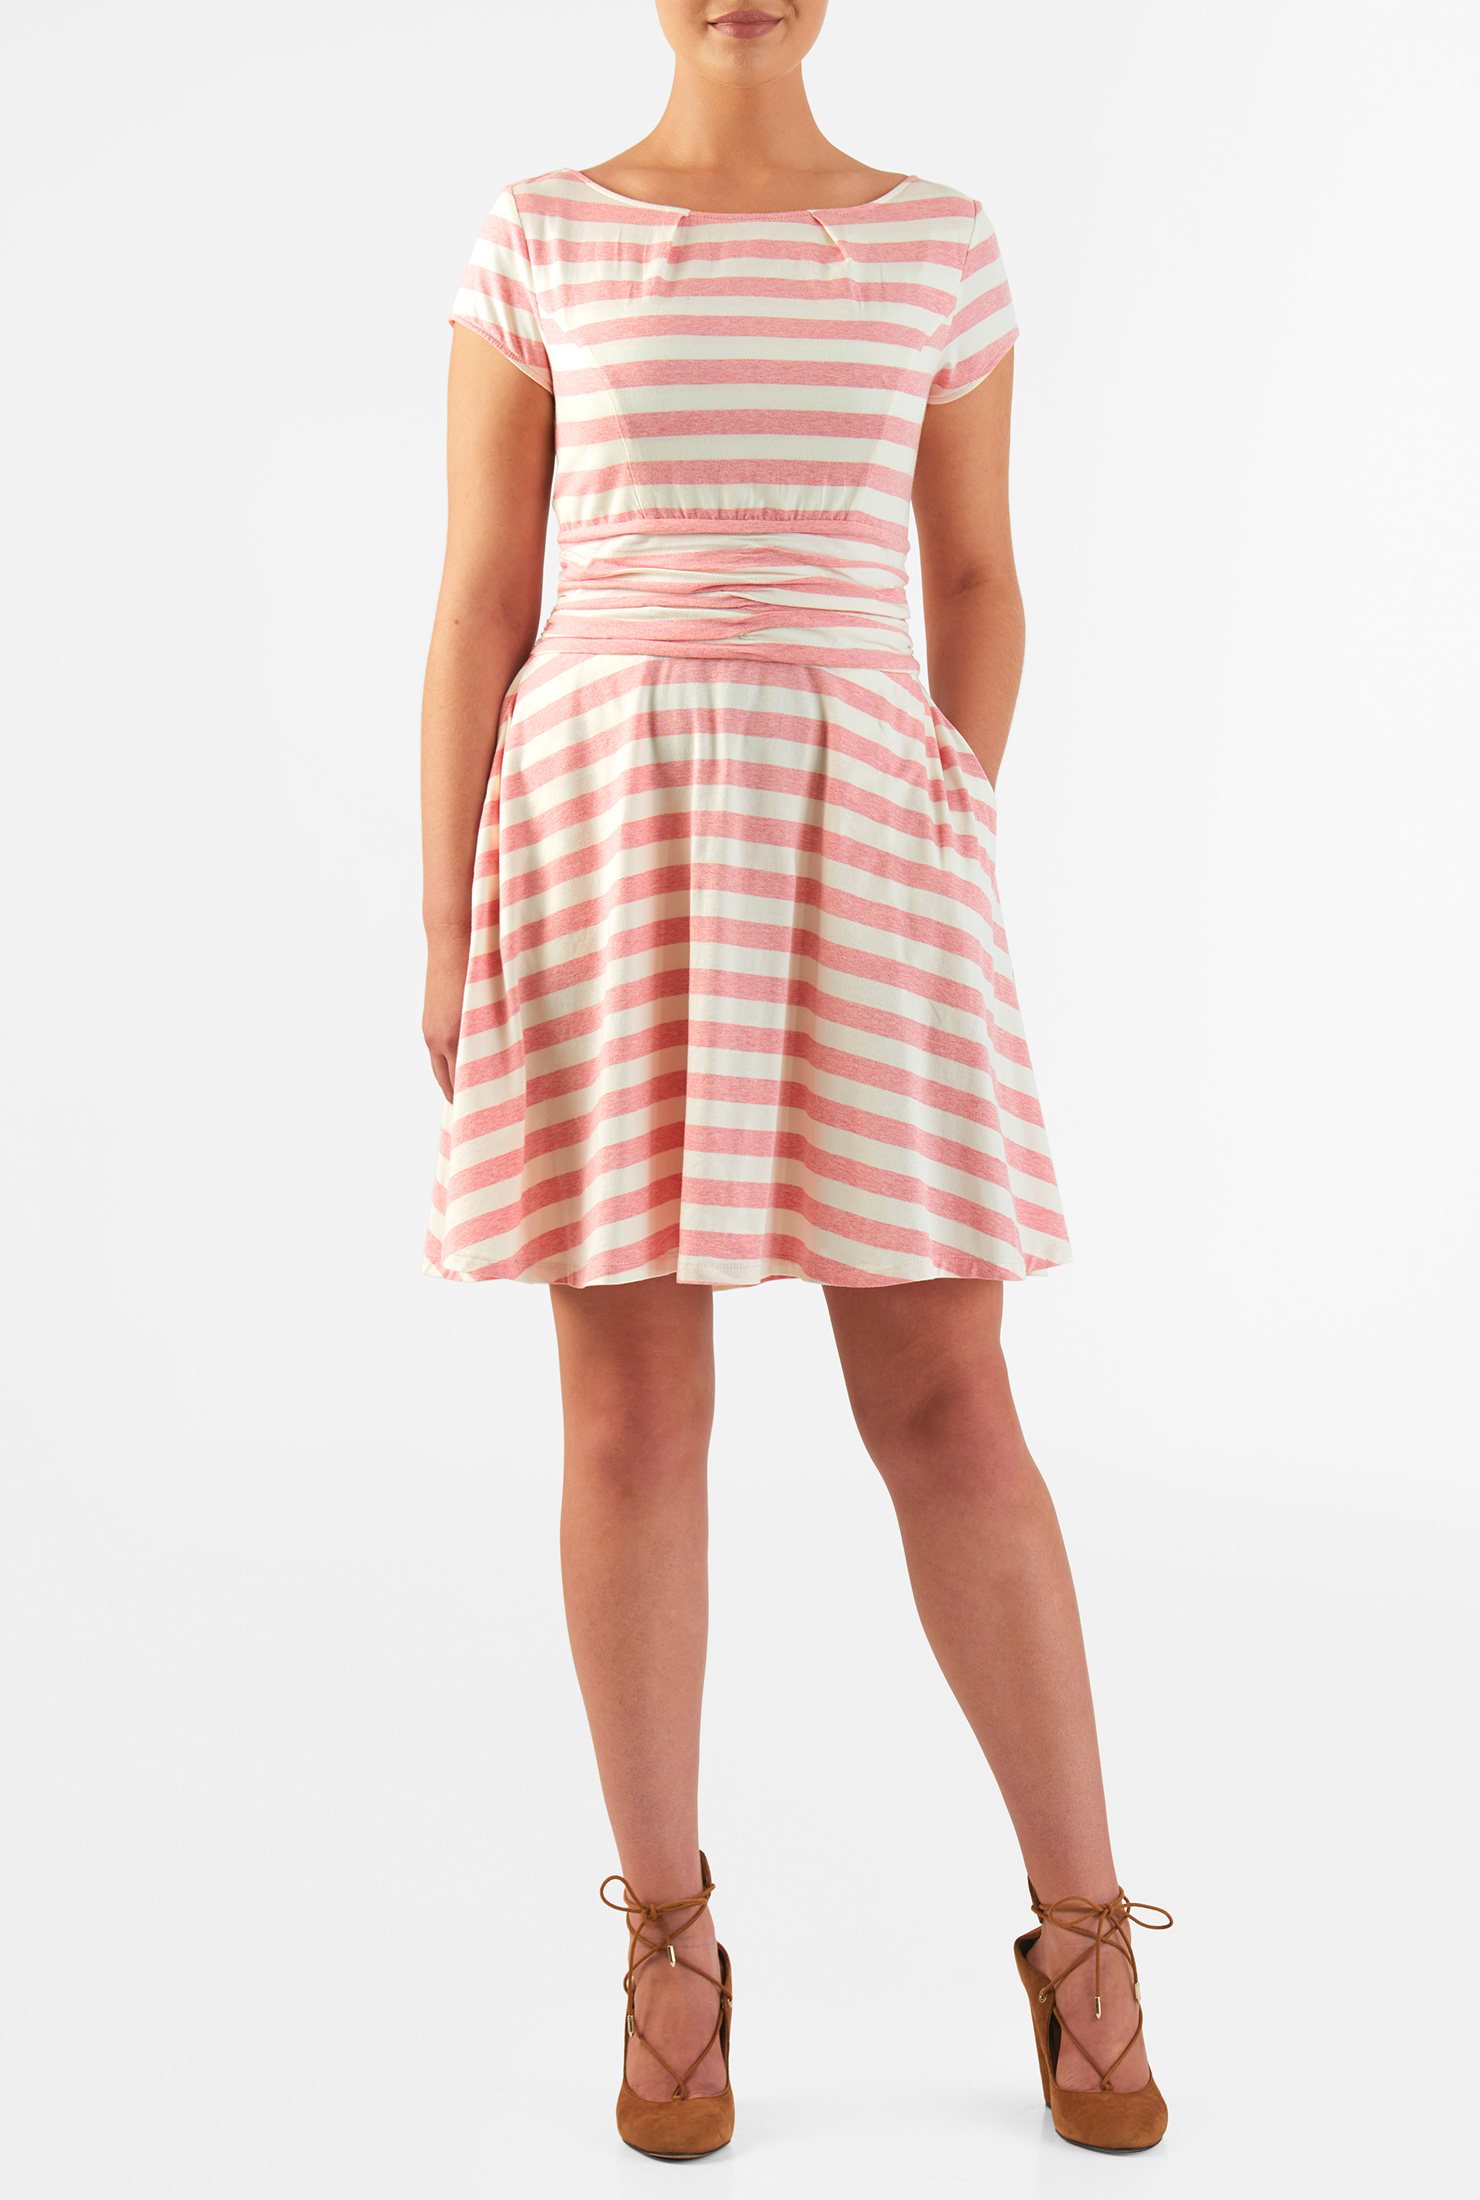 Eshakti Womens Pleat Waist Stripe Cotton Knit Dress